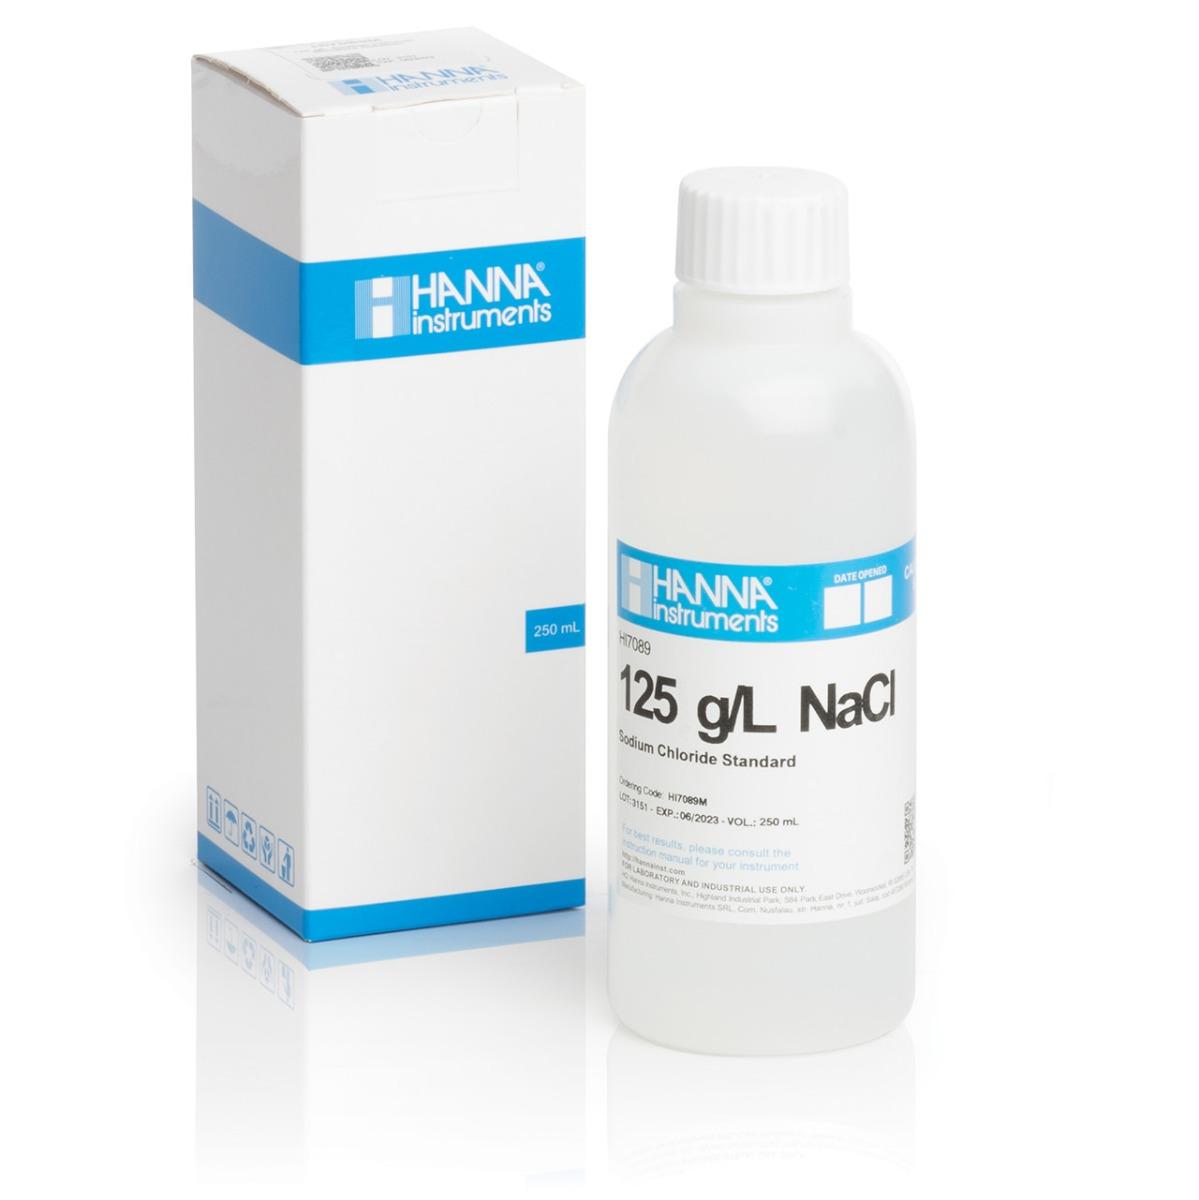 HI7089M 125 g/L NaCl Standard Solution (230 mL Bottle)